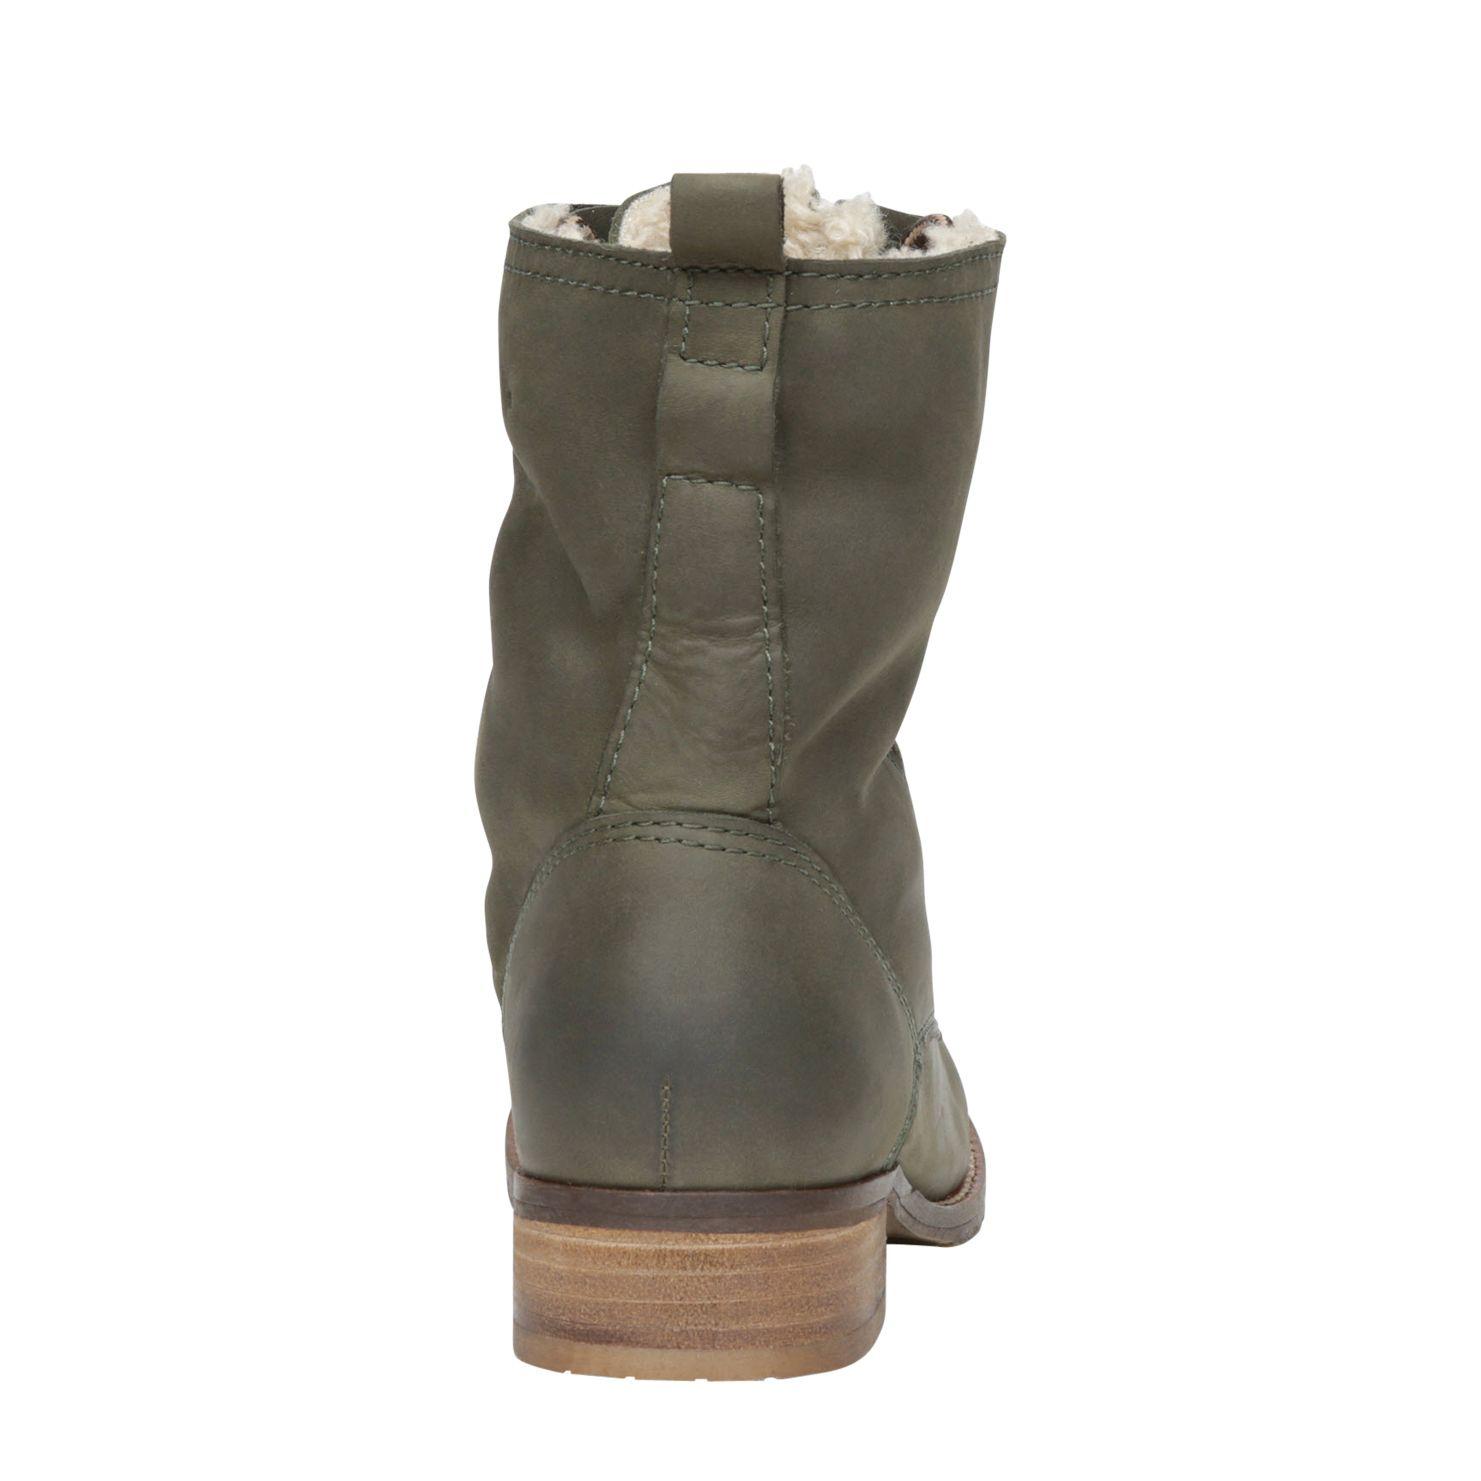 ALDO Fonterutoli Lace Up Military Boots in Green